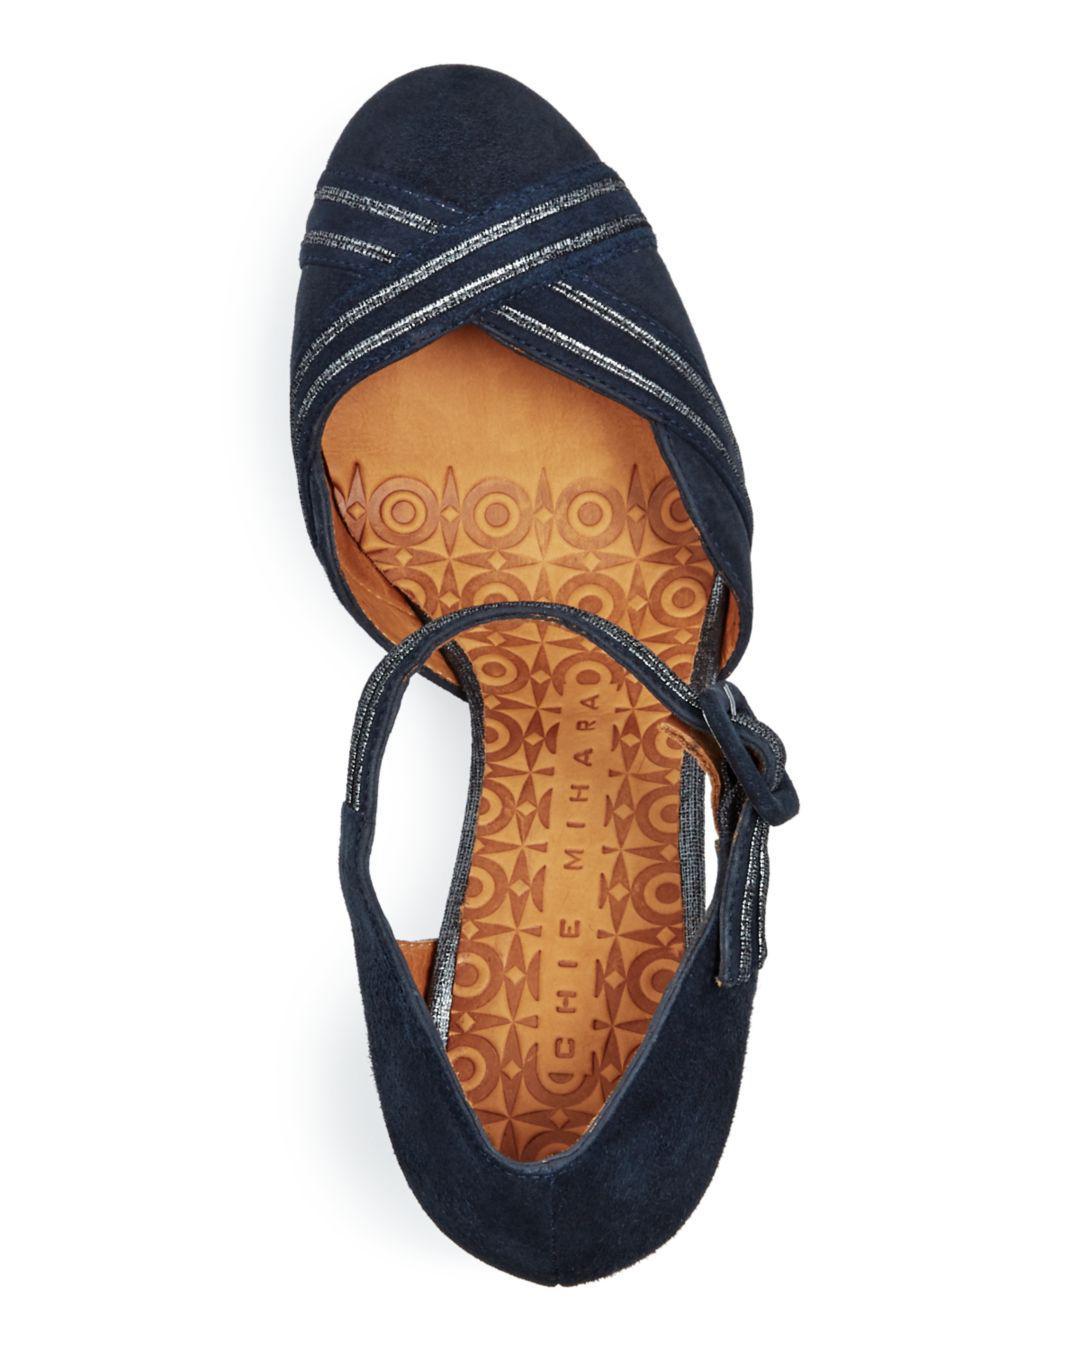 9f703d7415a Chie Mihara - Gray Women s Kilo Suede Block-heel Pumps - Lyst. View  fullscreen